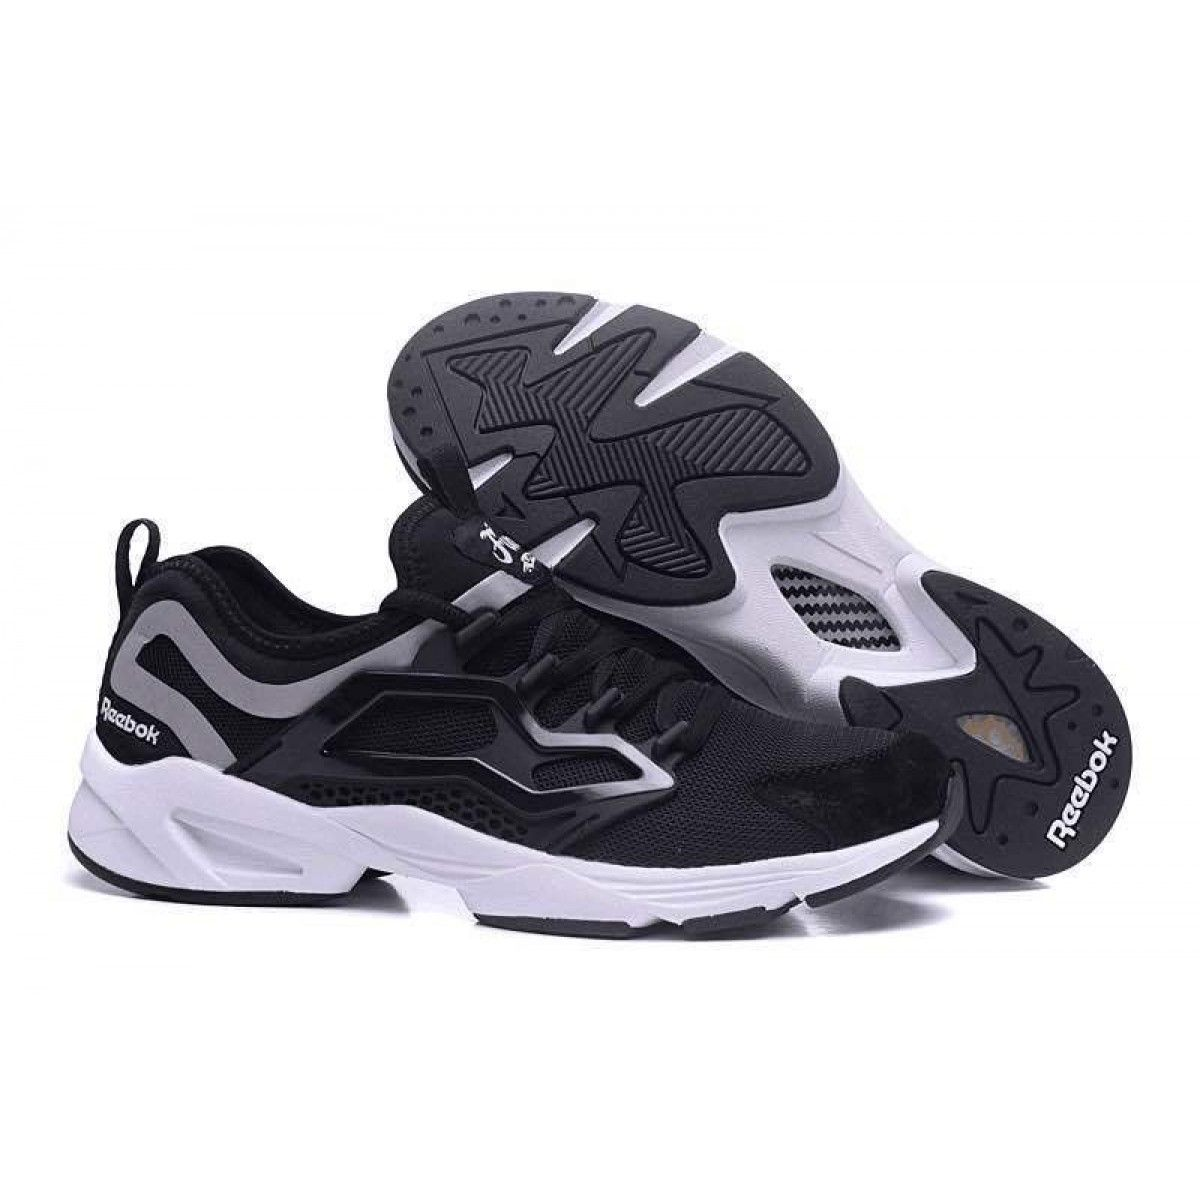 Reebok Fury Adapt Men's Running Shoe - Army Green/Black | Fashion Style |  Pinterest | Army green and Reebok